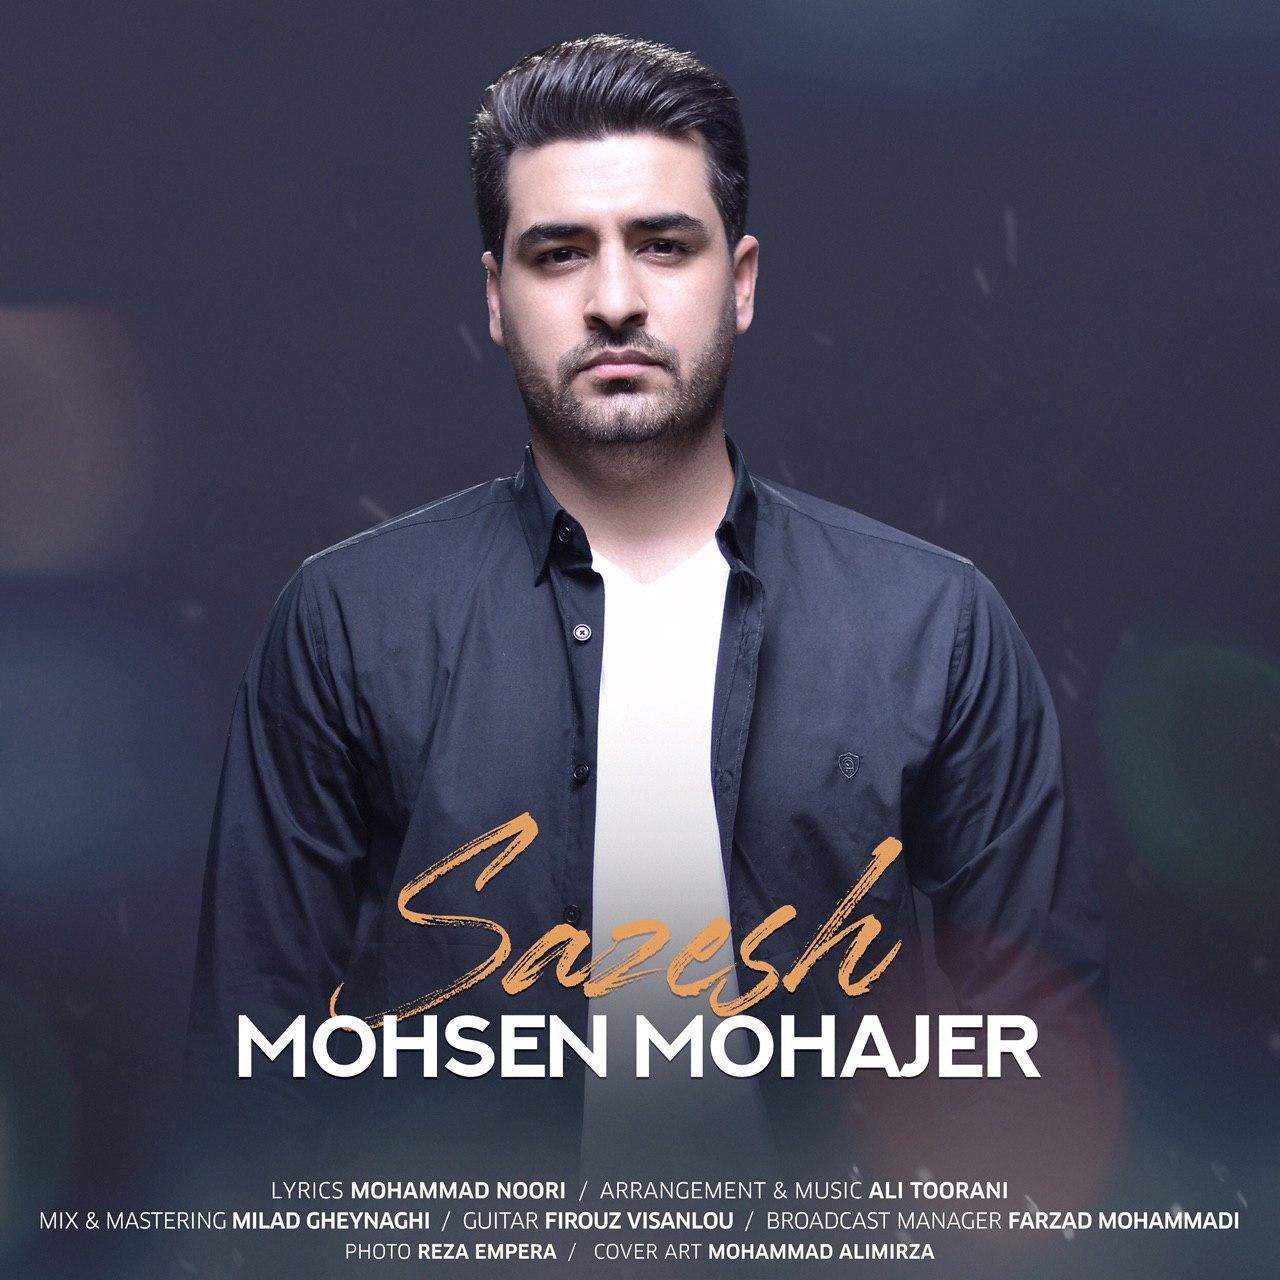 Mohsen Mohajer – Sazesh